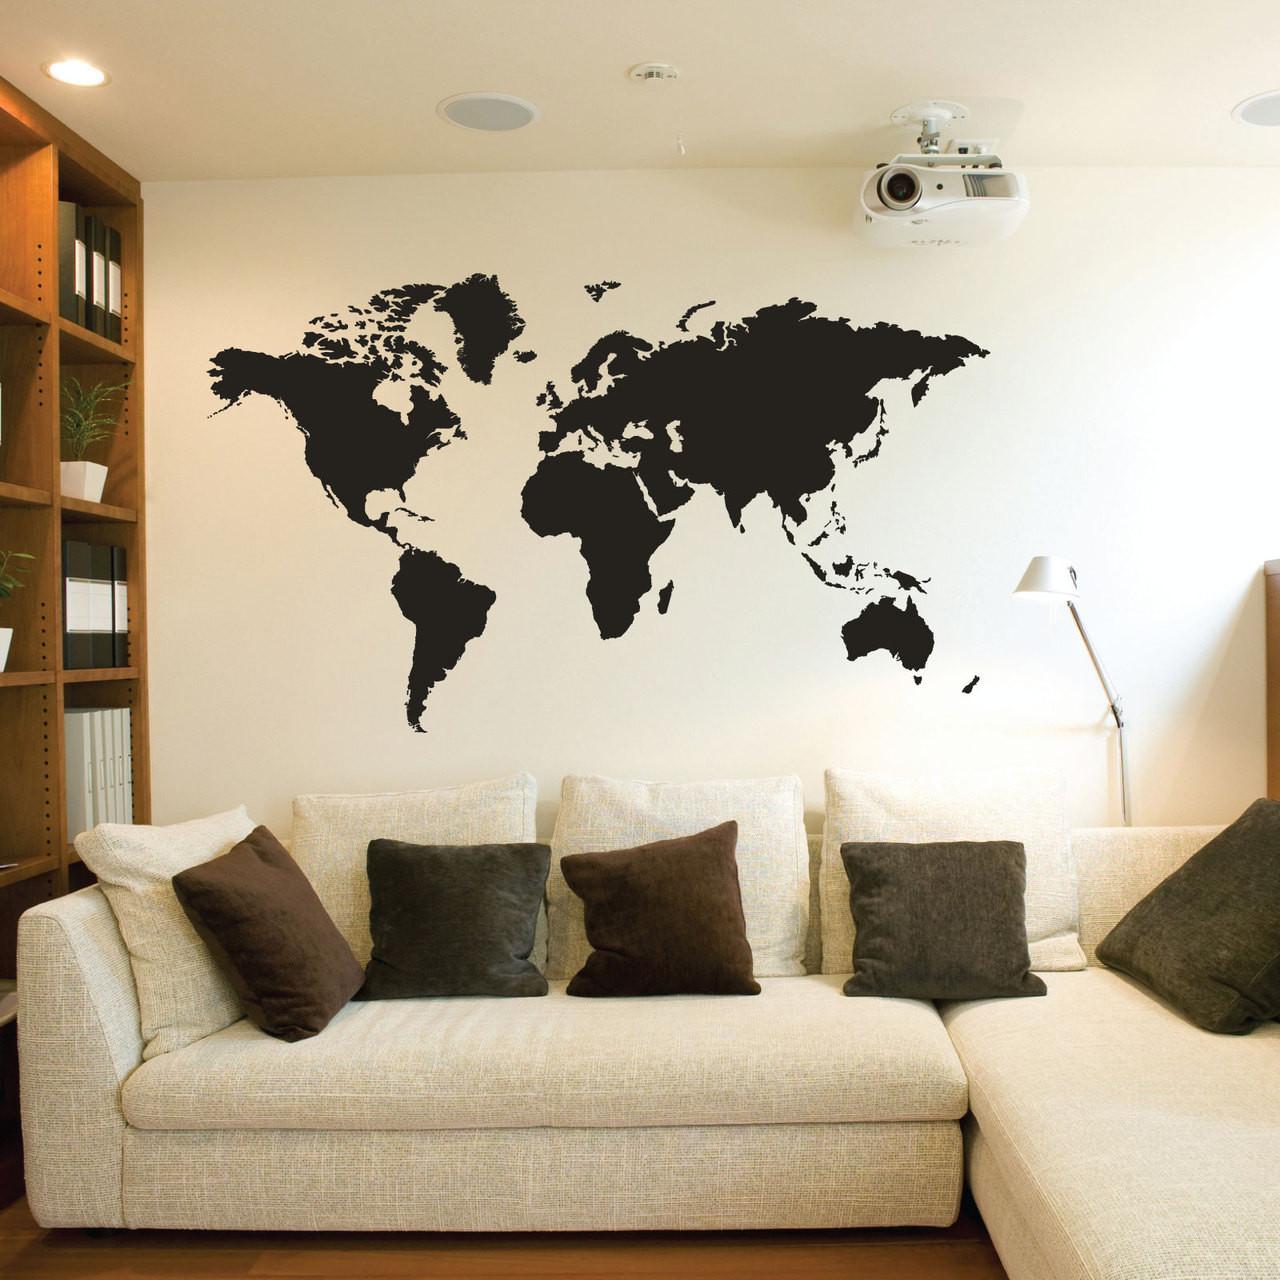 Large World Map Wall Sticker 89407 - Stickers Wall